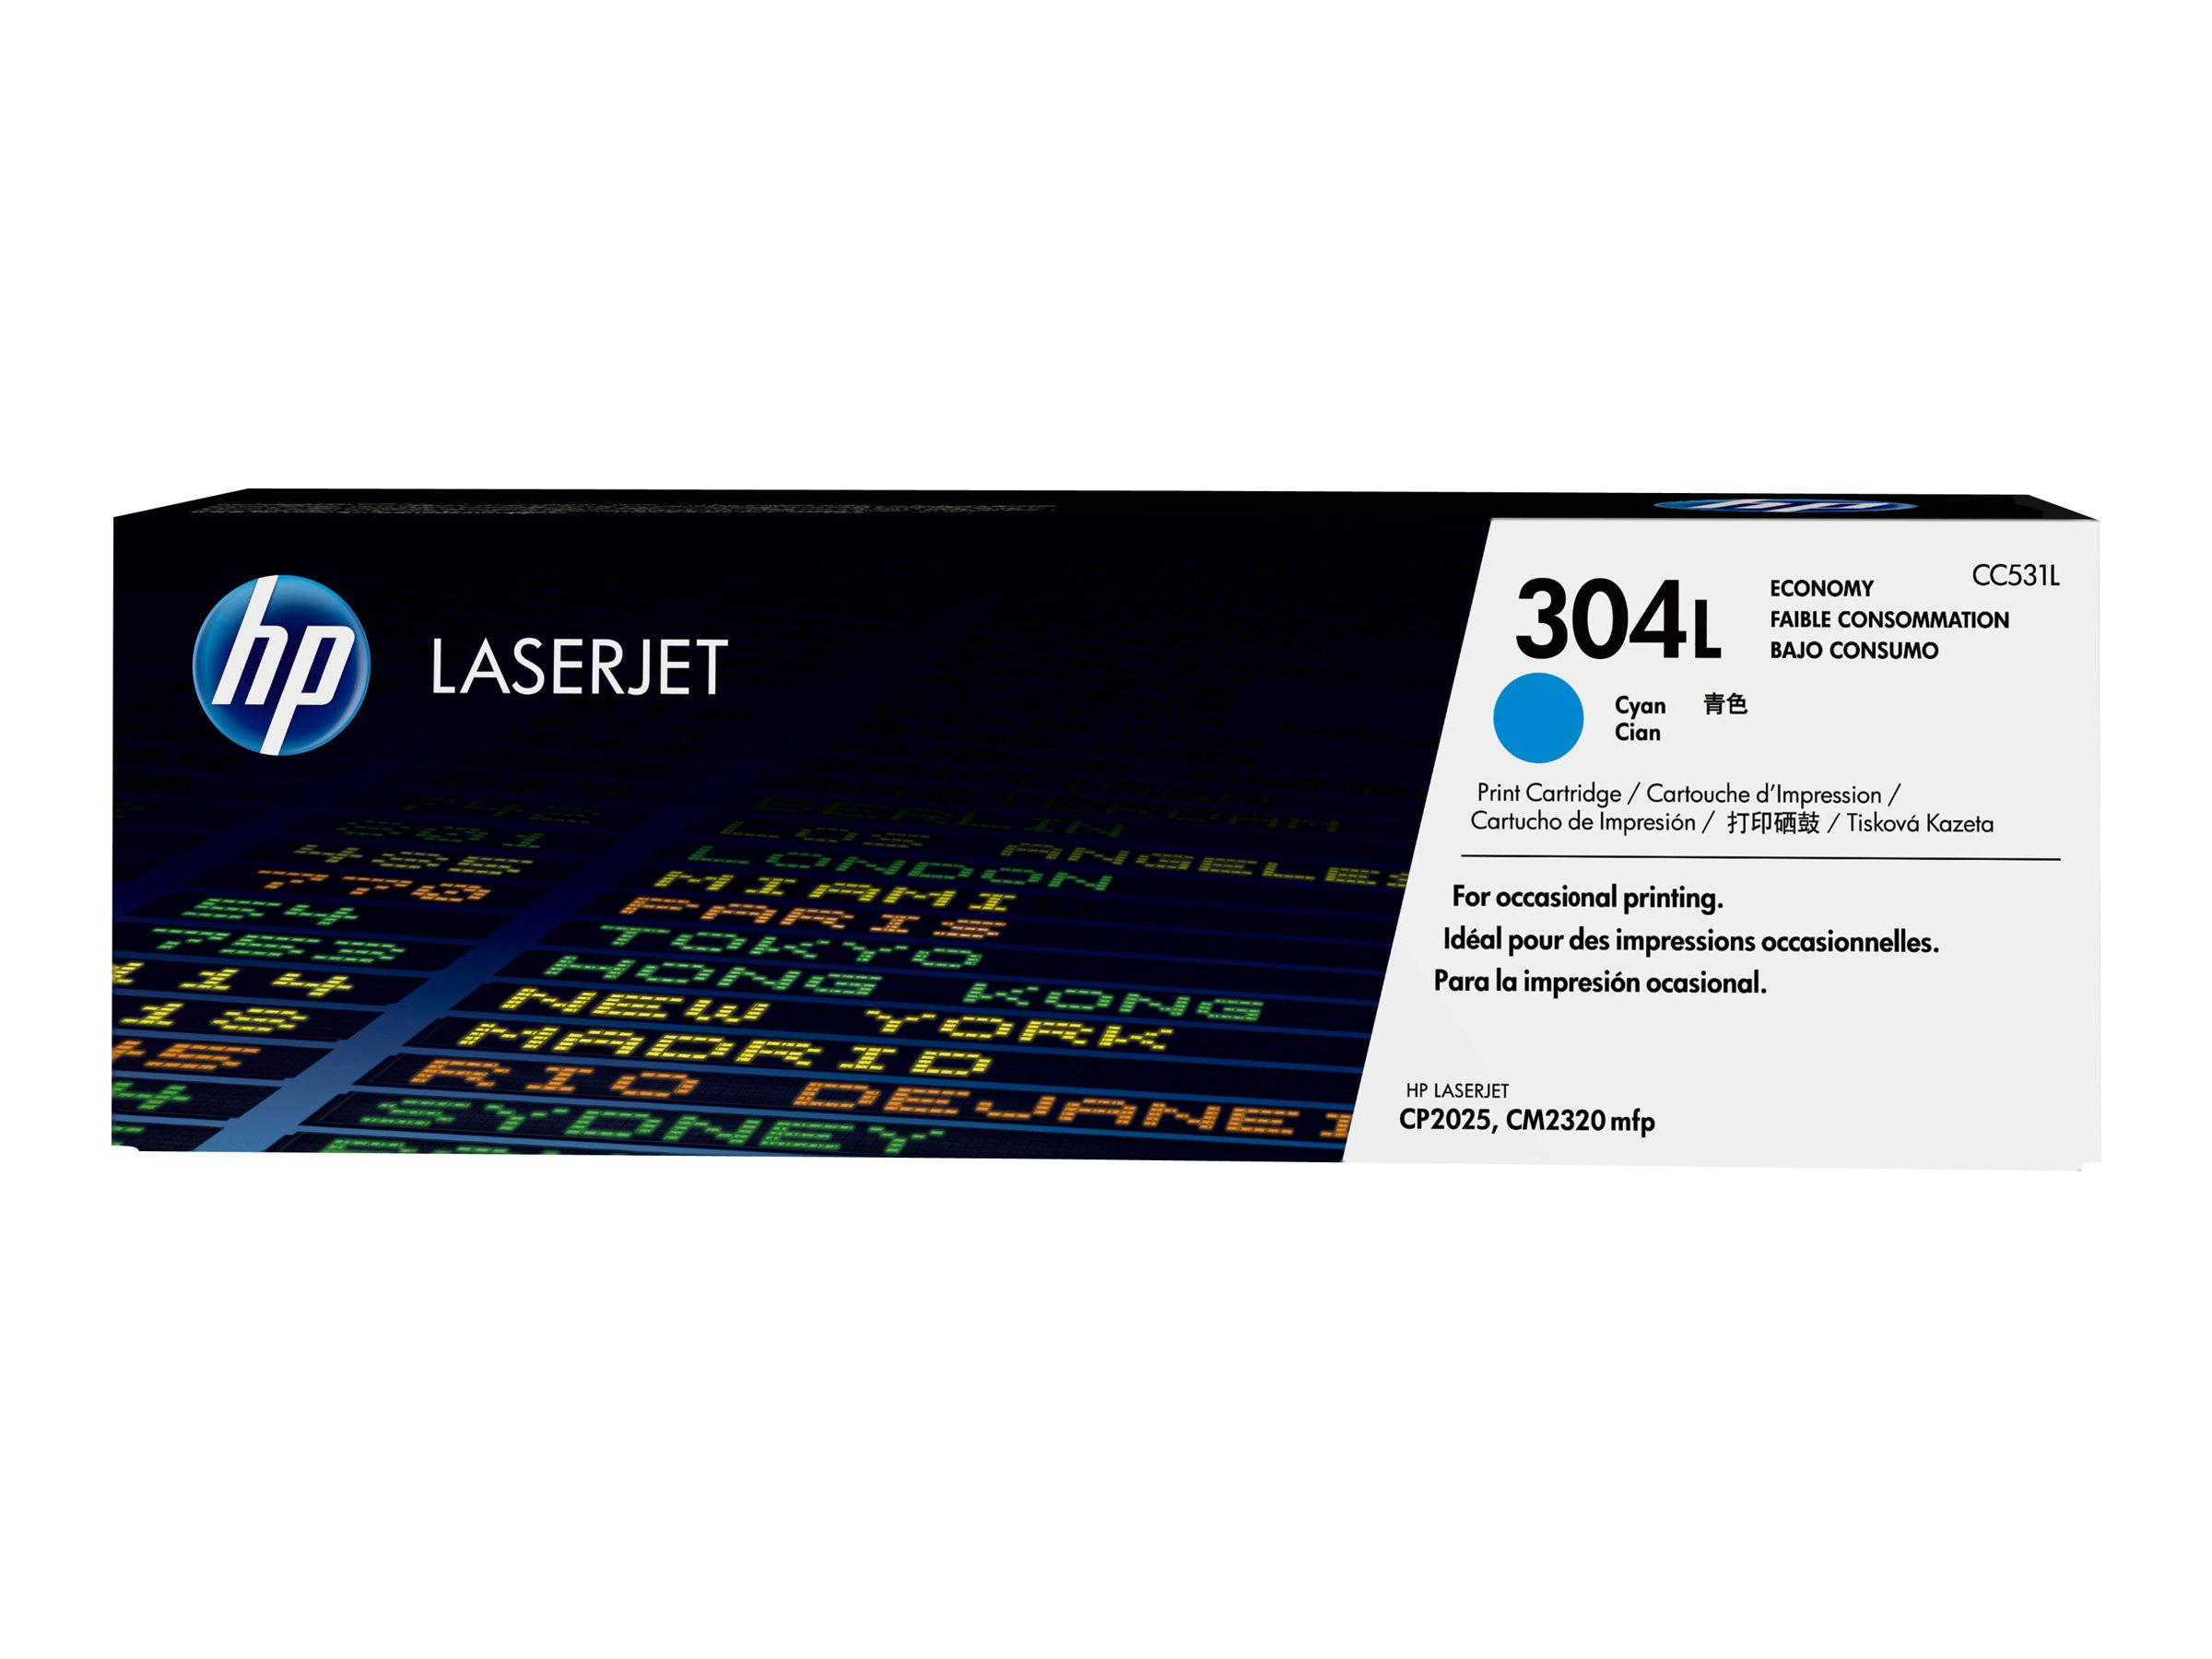 HP 304L - Economy - Cyan - Original - LaserJet - Tonerpatrone (CC531L)